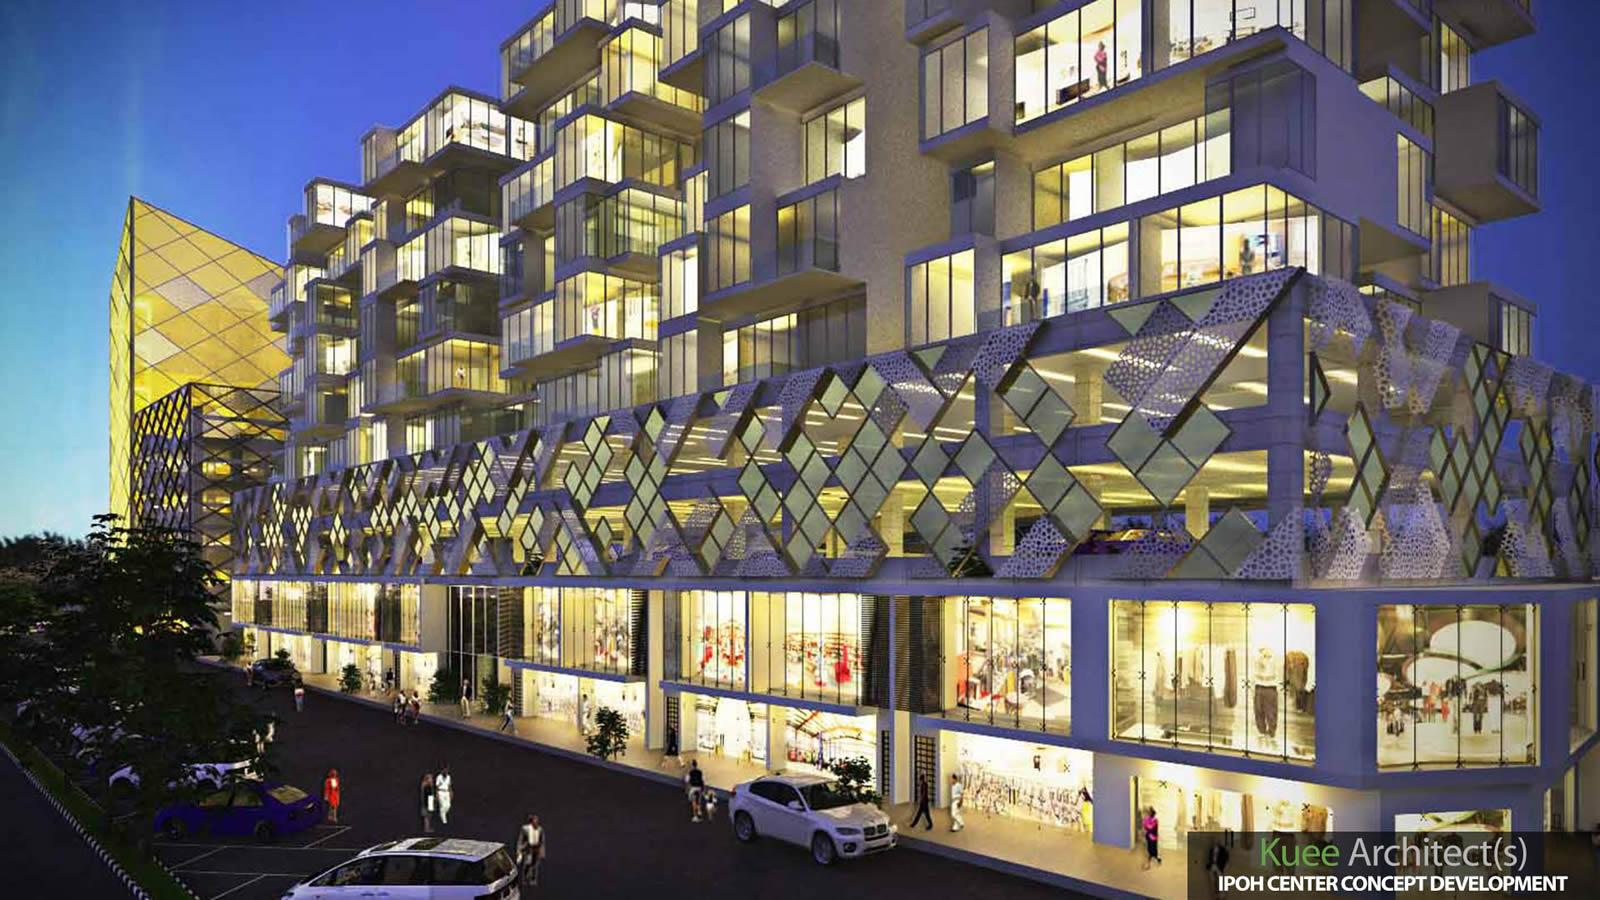 Ipoh signature landmark architecture design by Kuee Architect